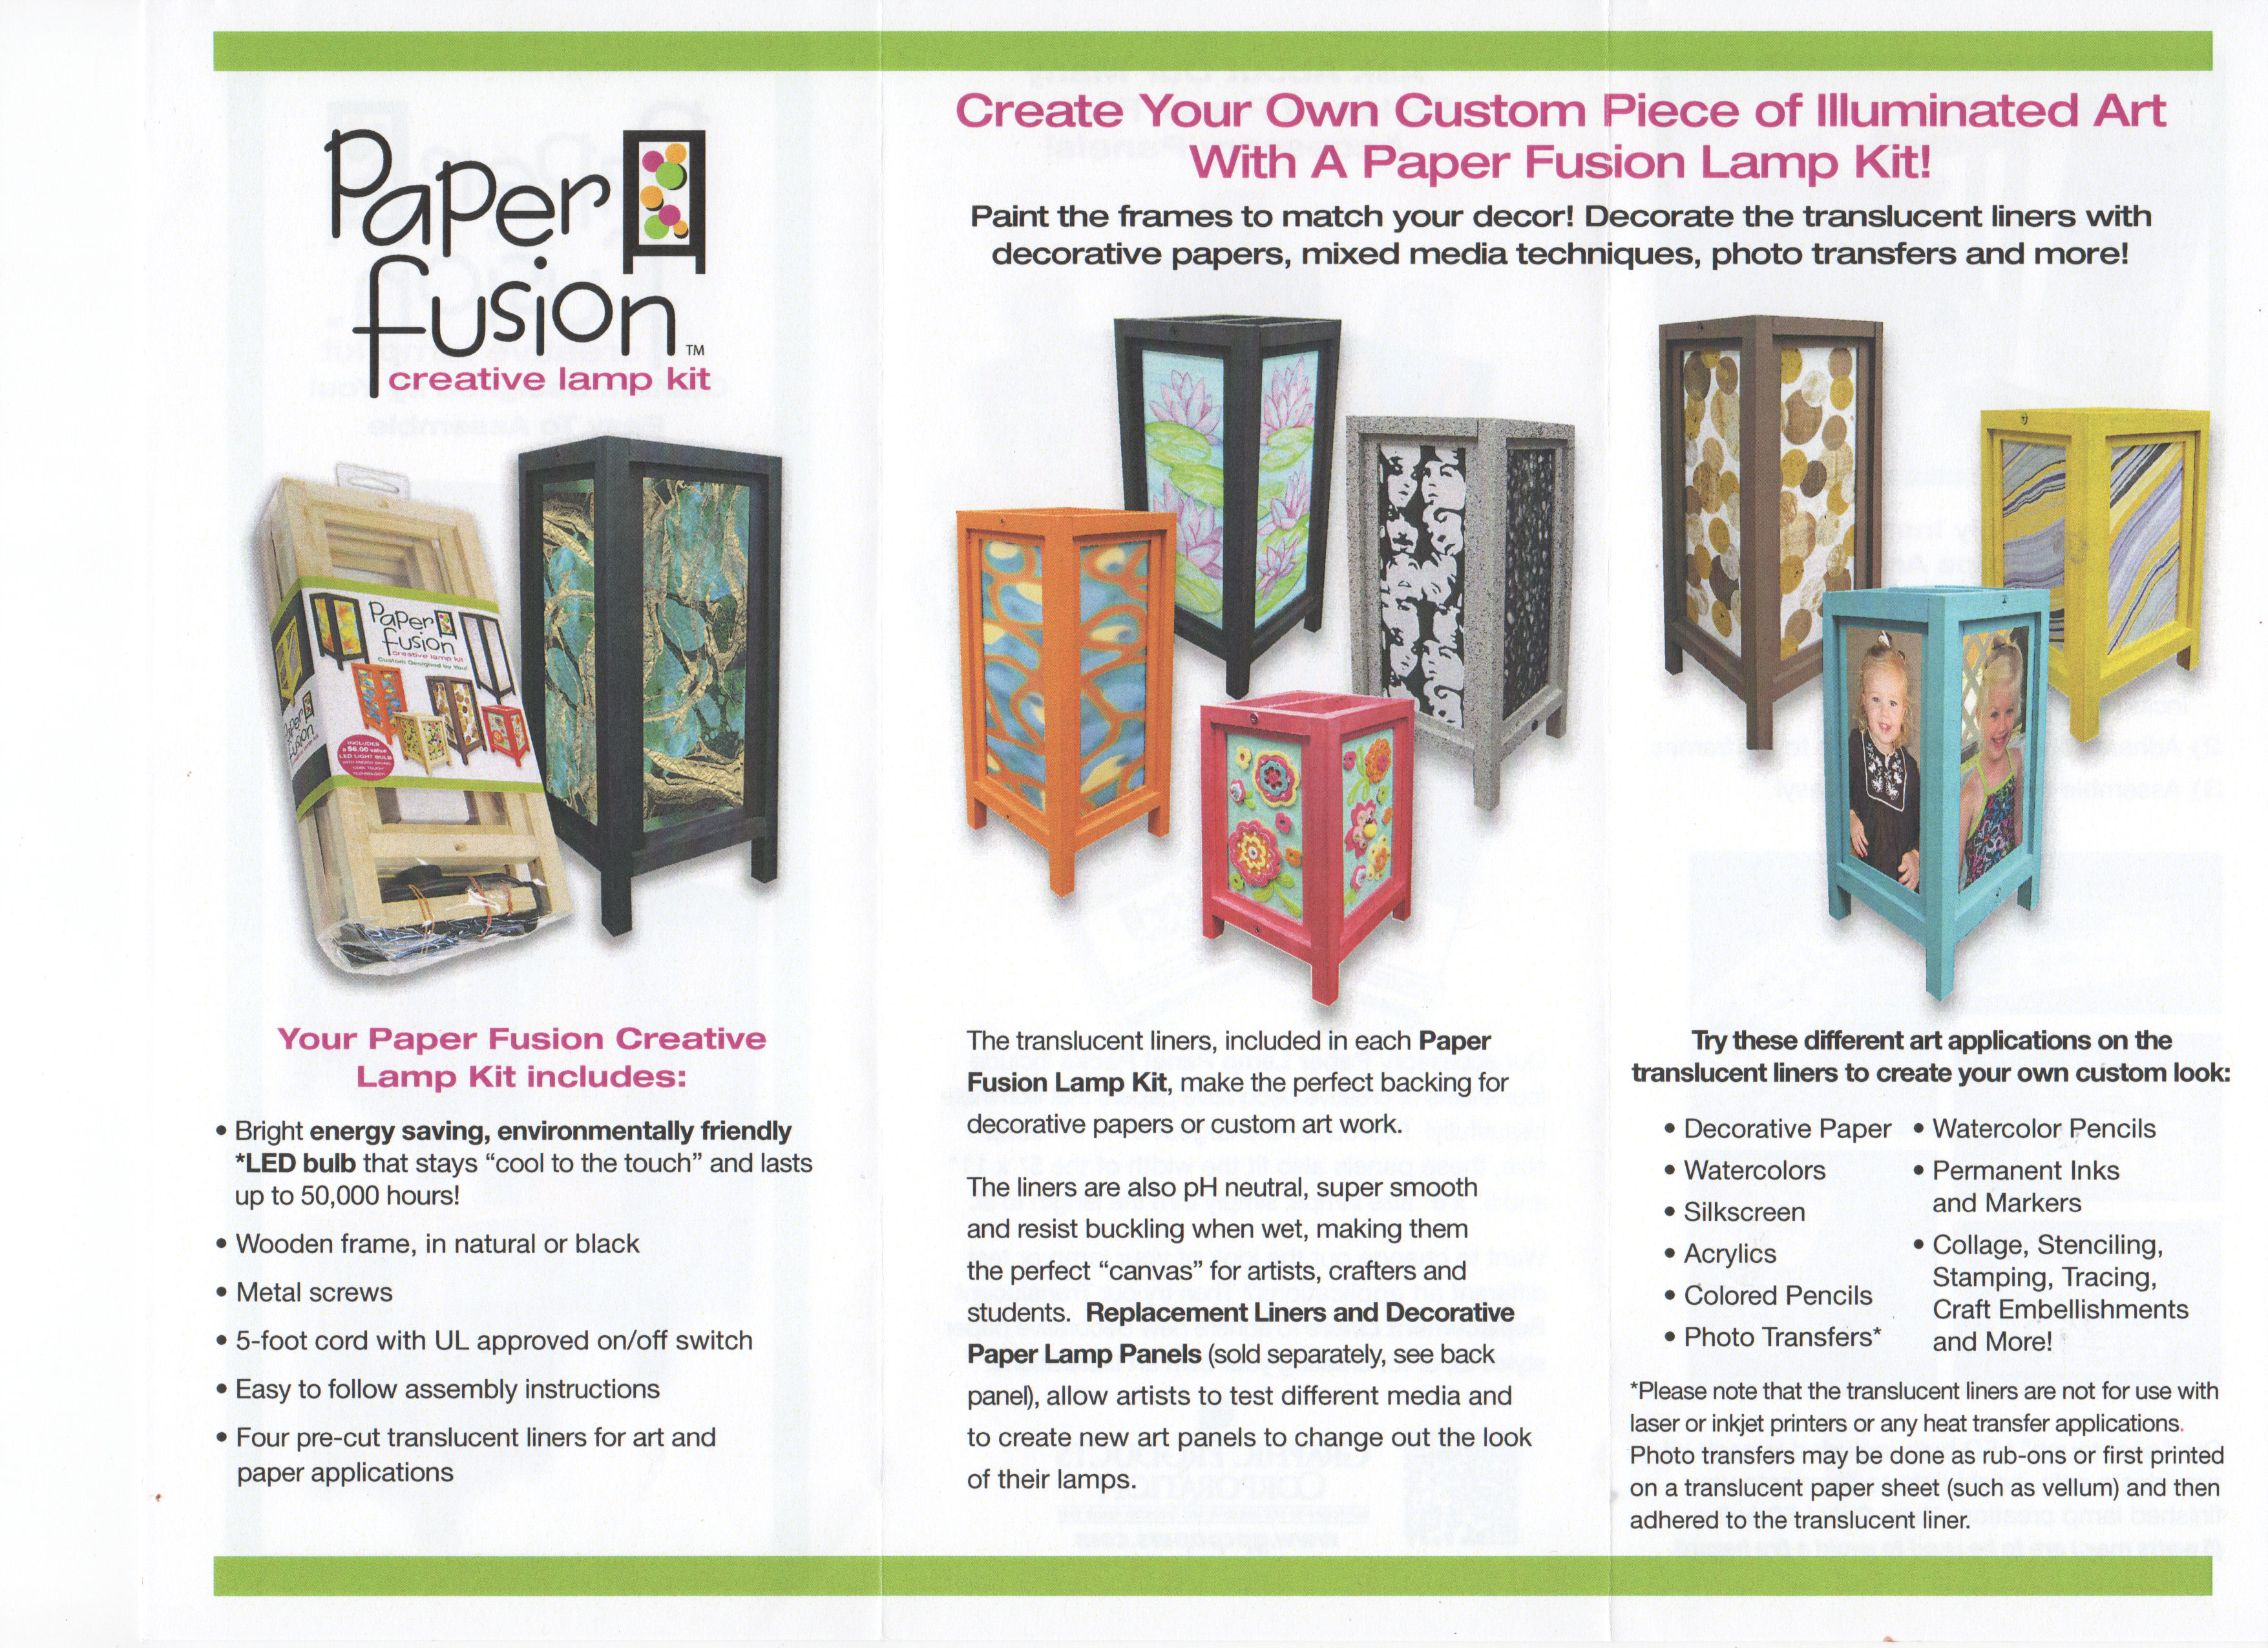 da-paper-fusion-lamp-kit-brochure-page-2.jpg